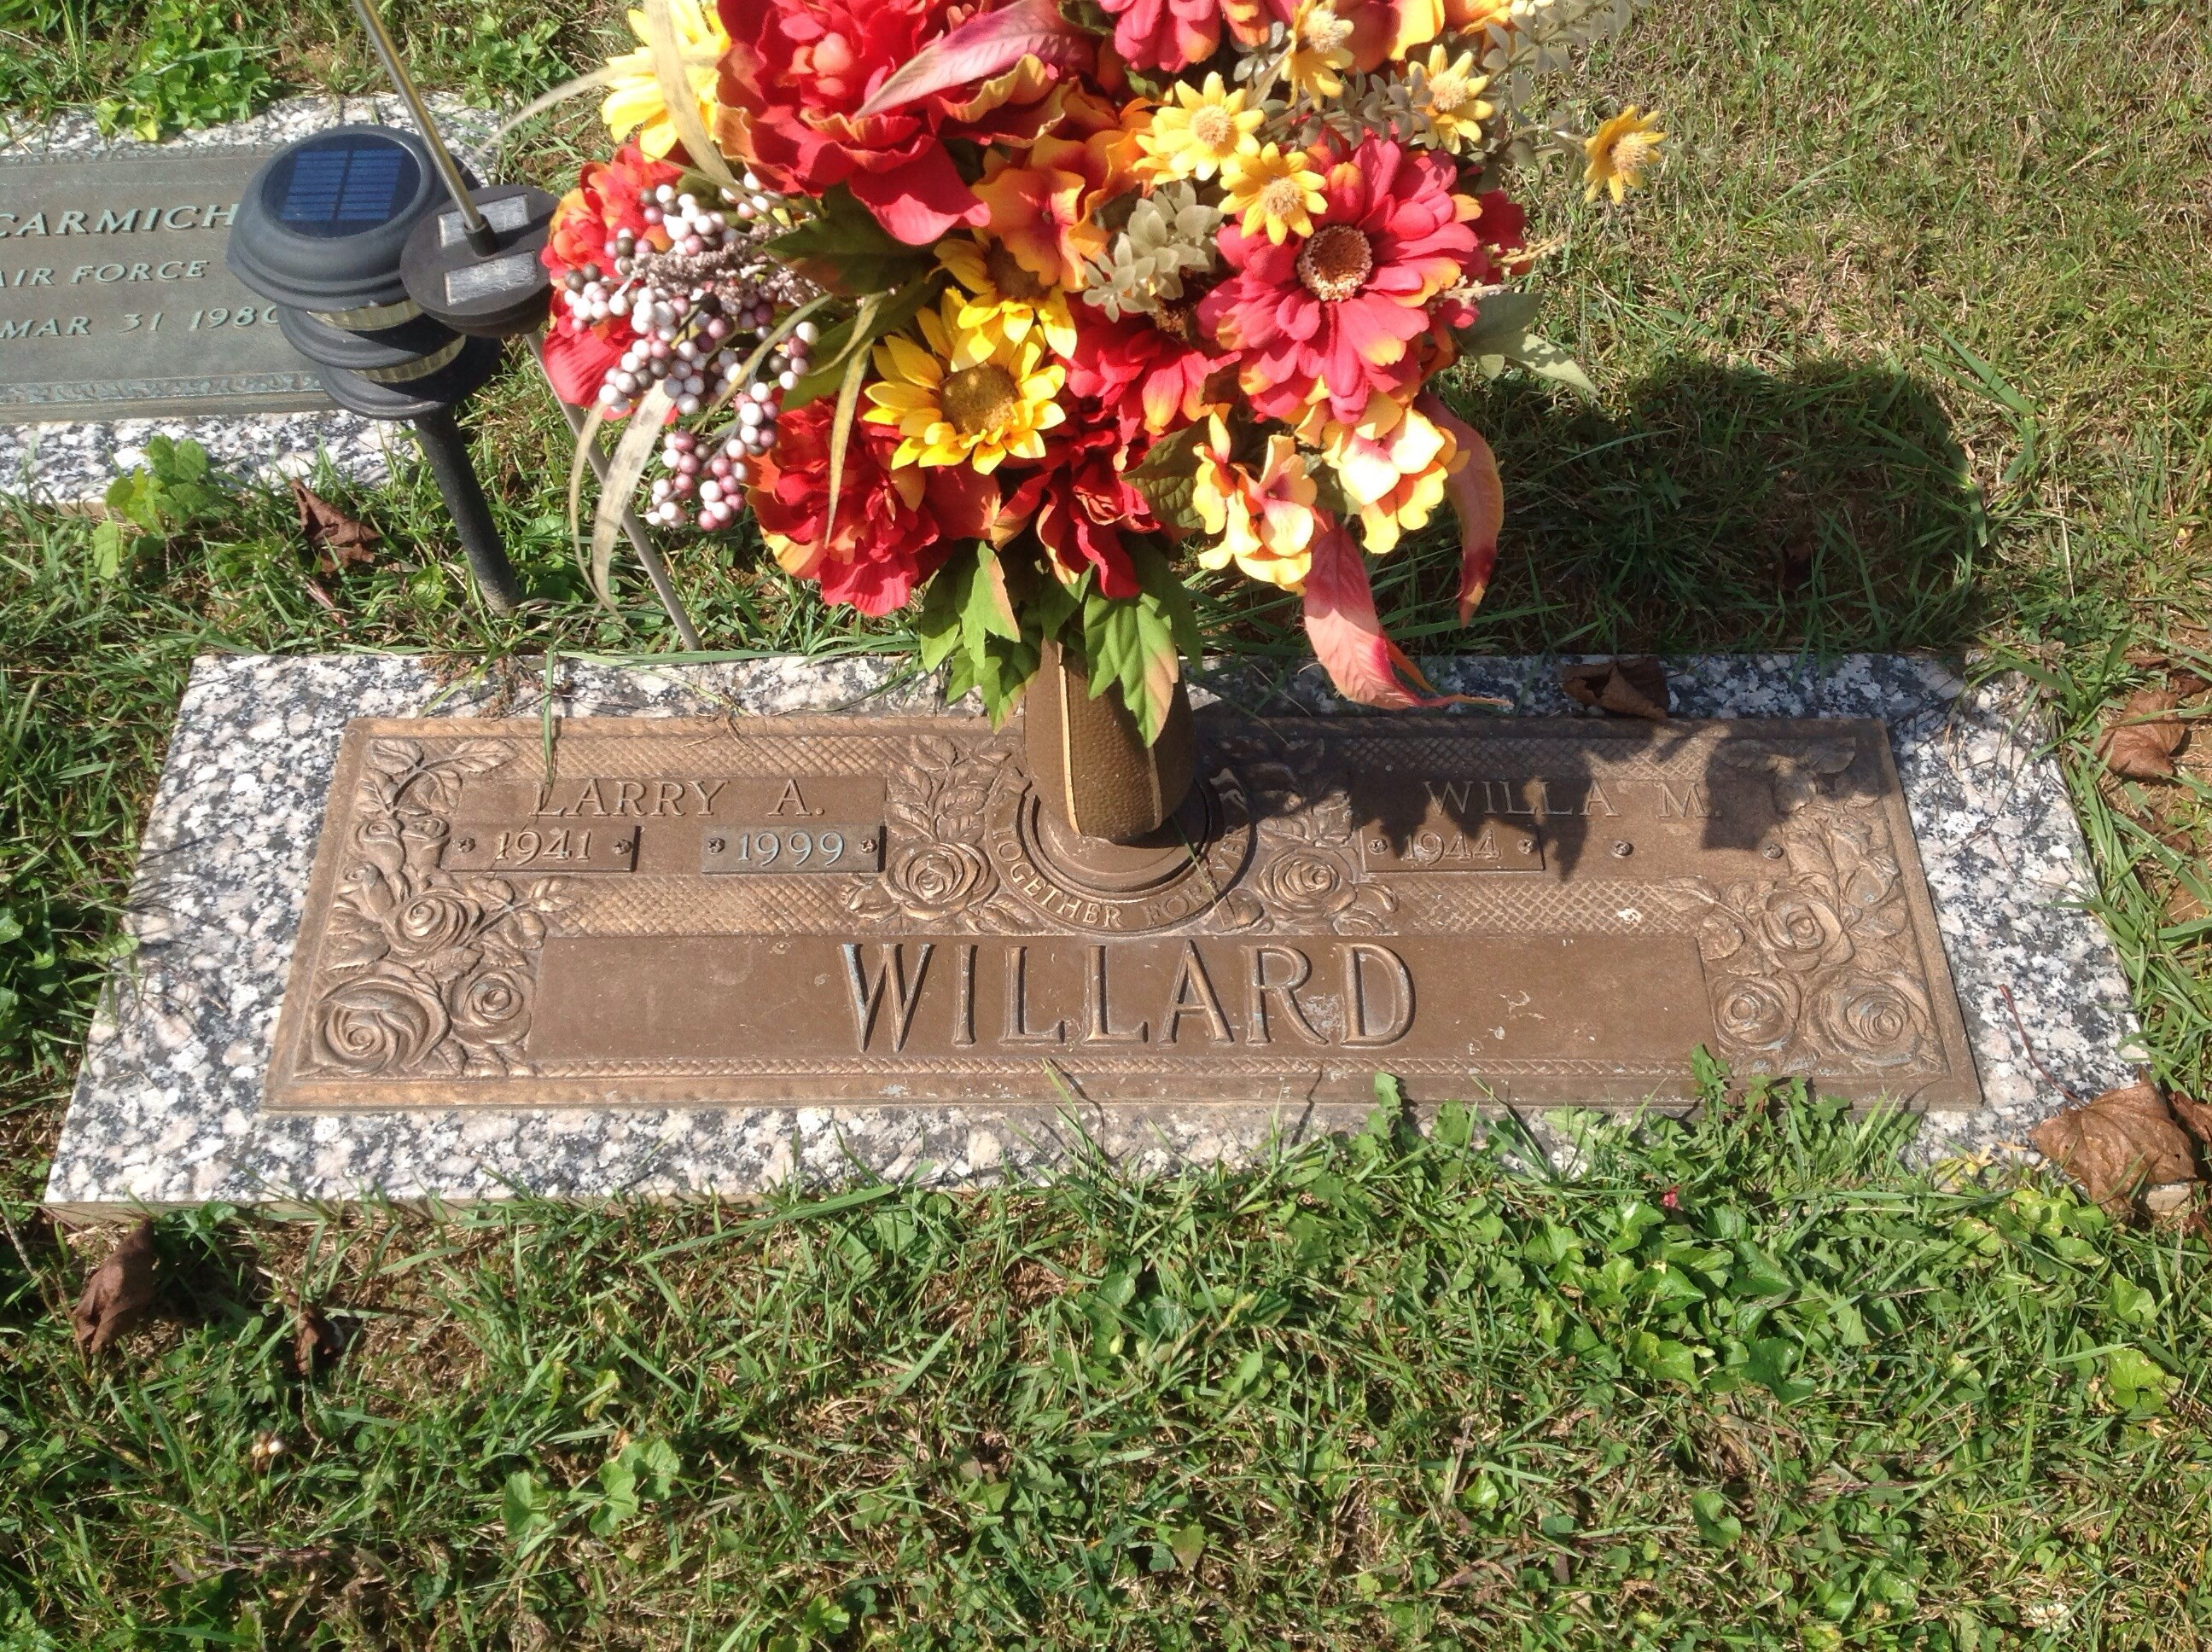 Alexander Tarbell Willard